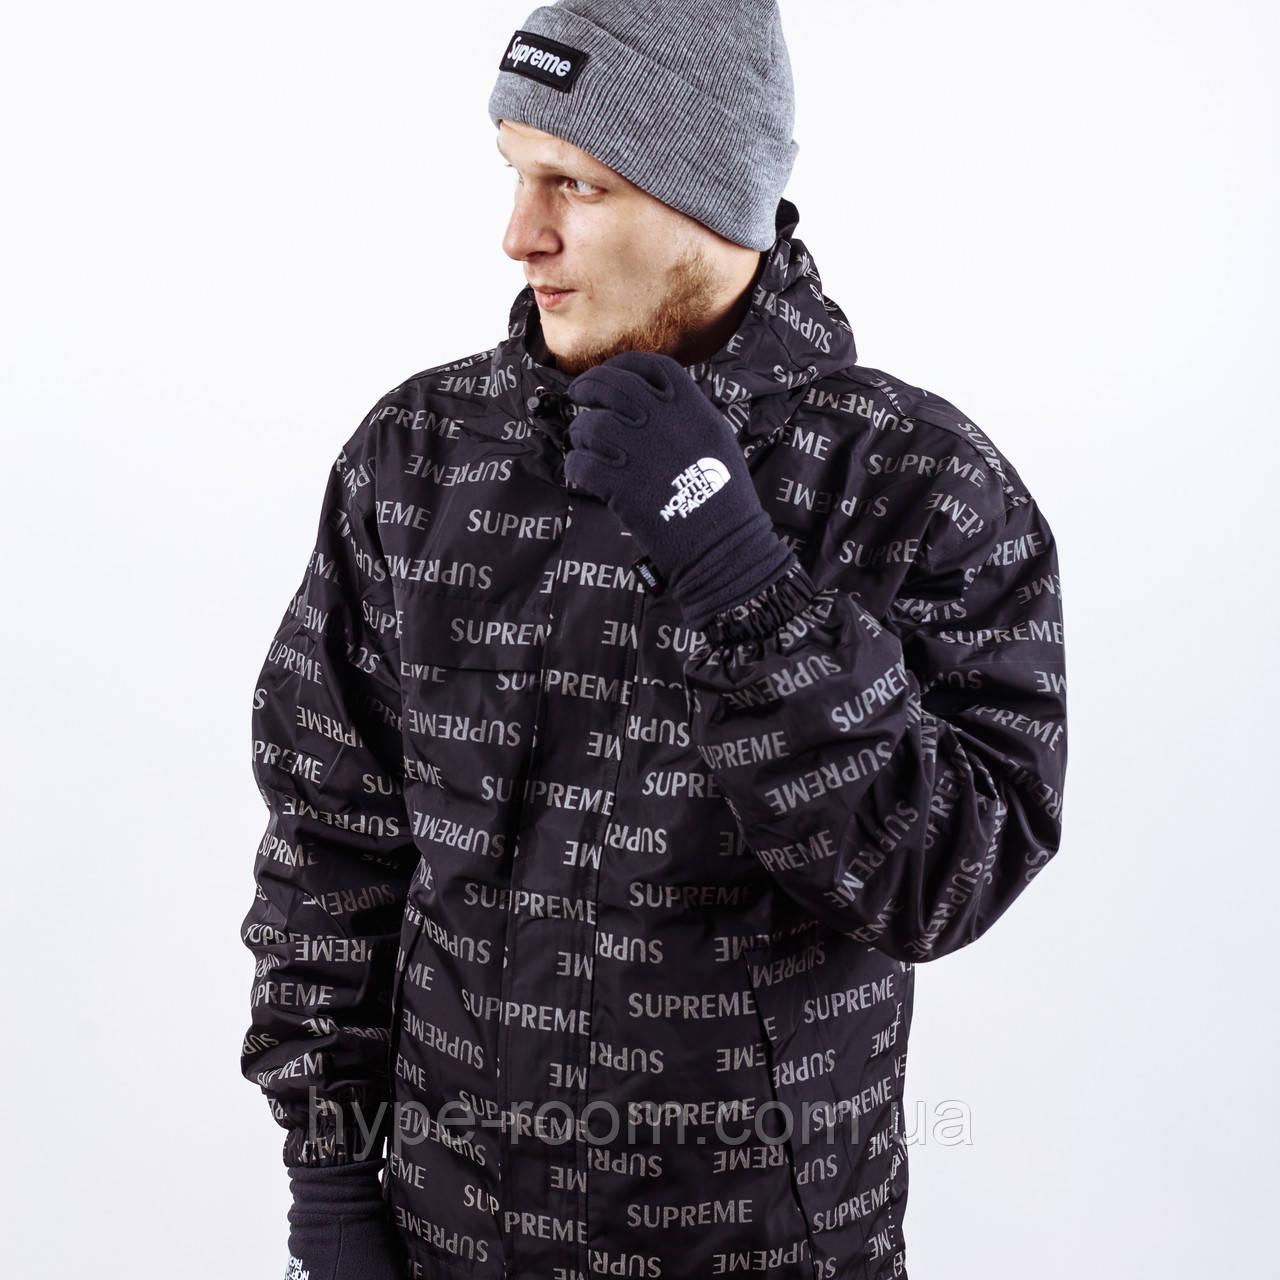 cb9f8013d80c Рефлективная Куртка Supreme Реплика, цена 1 630 грн., купить в ...